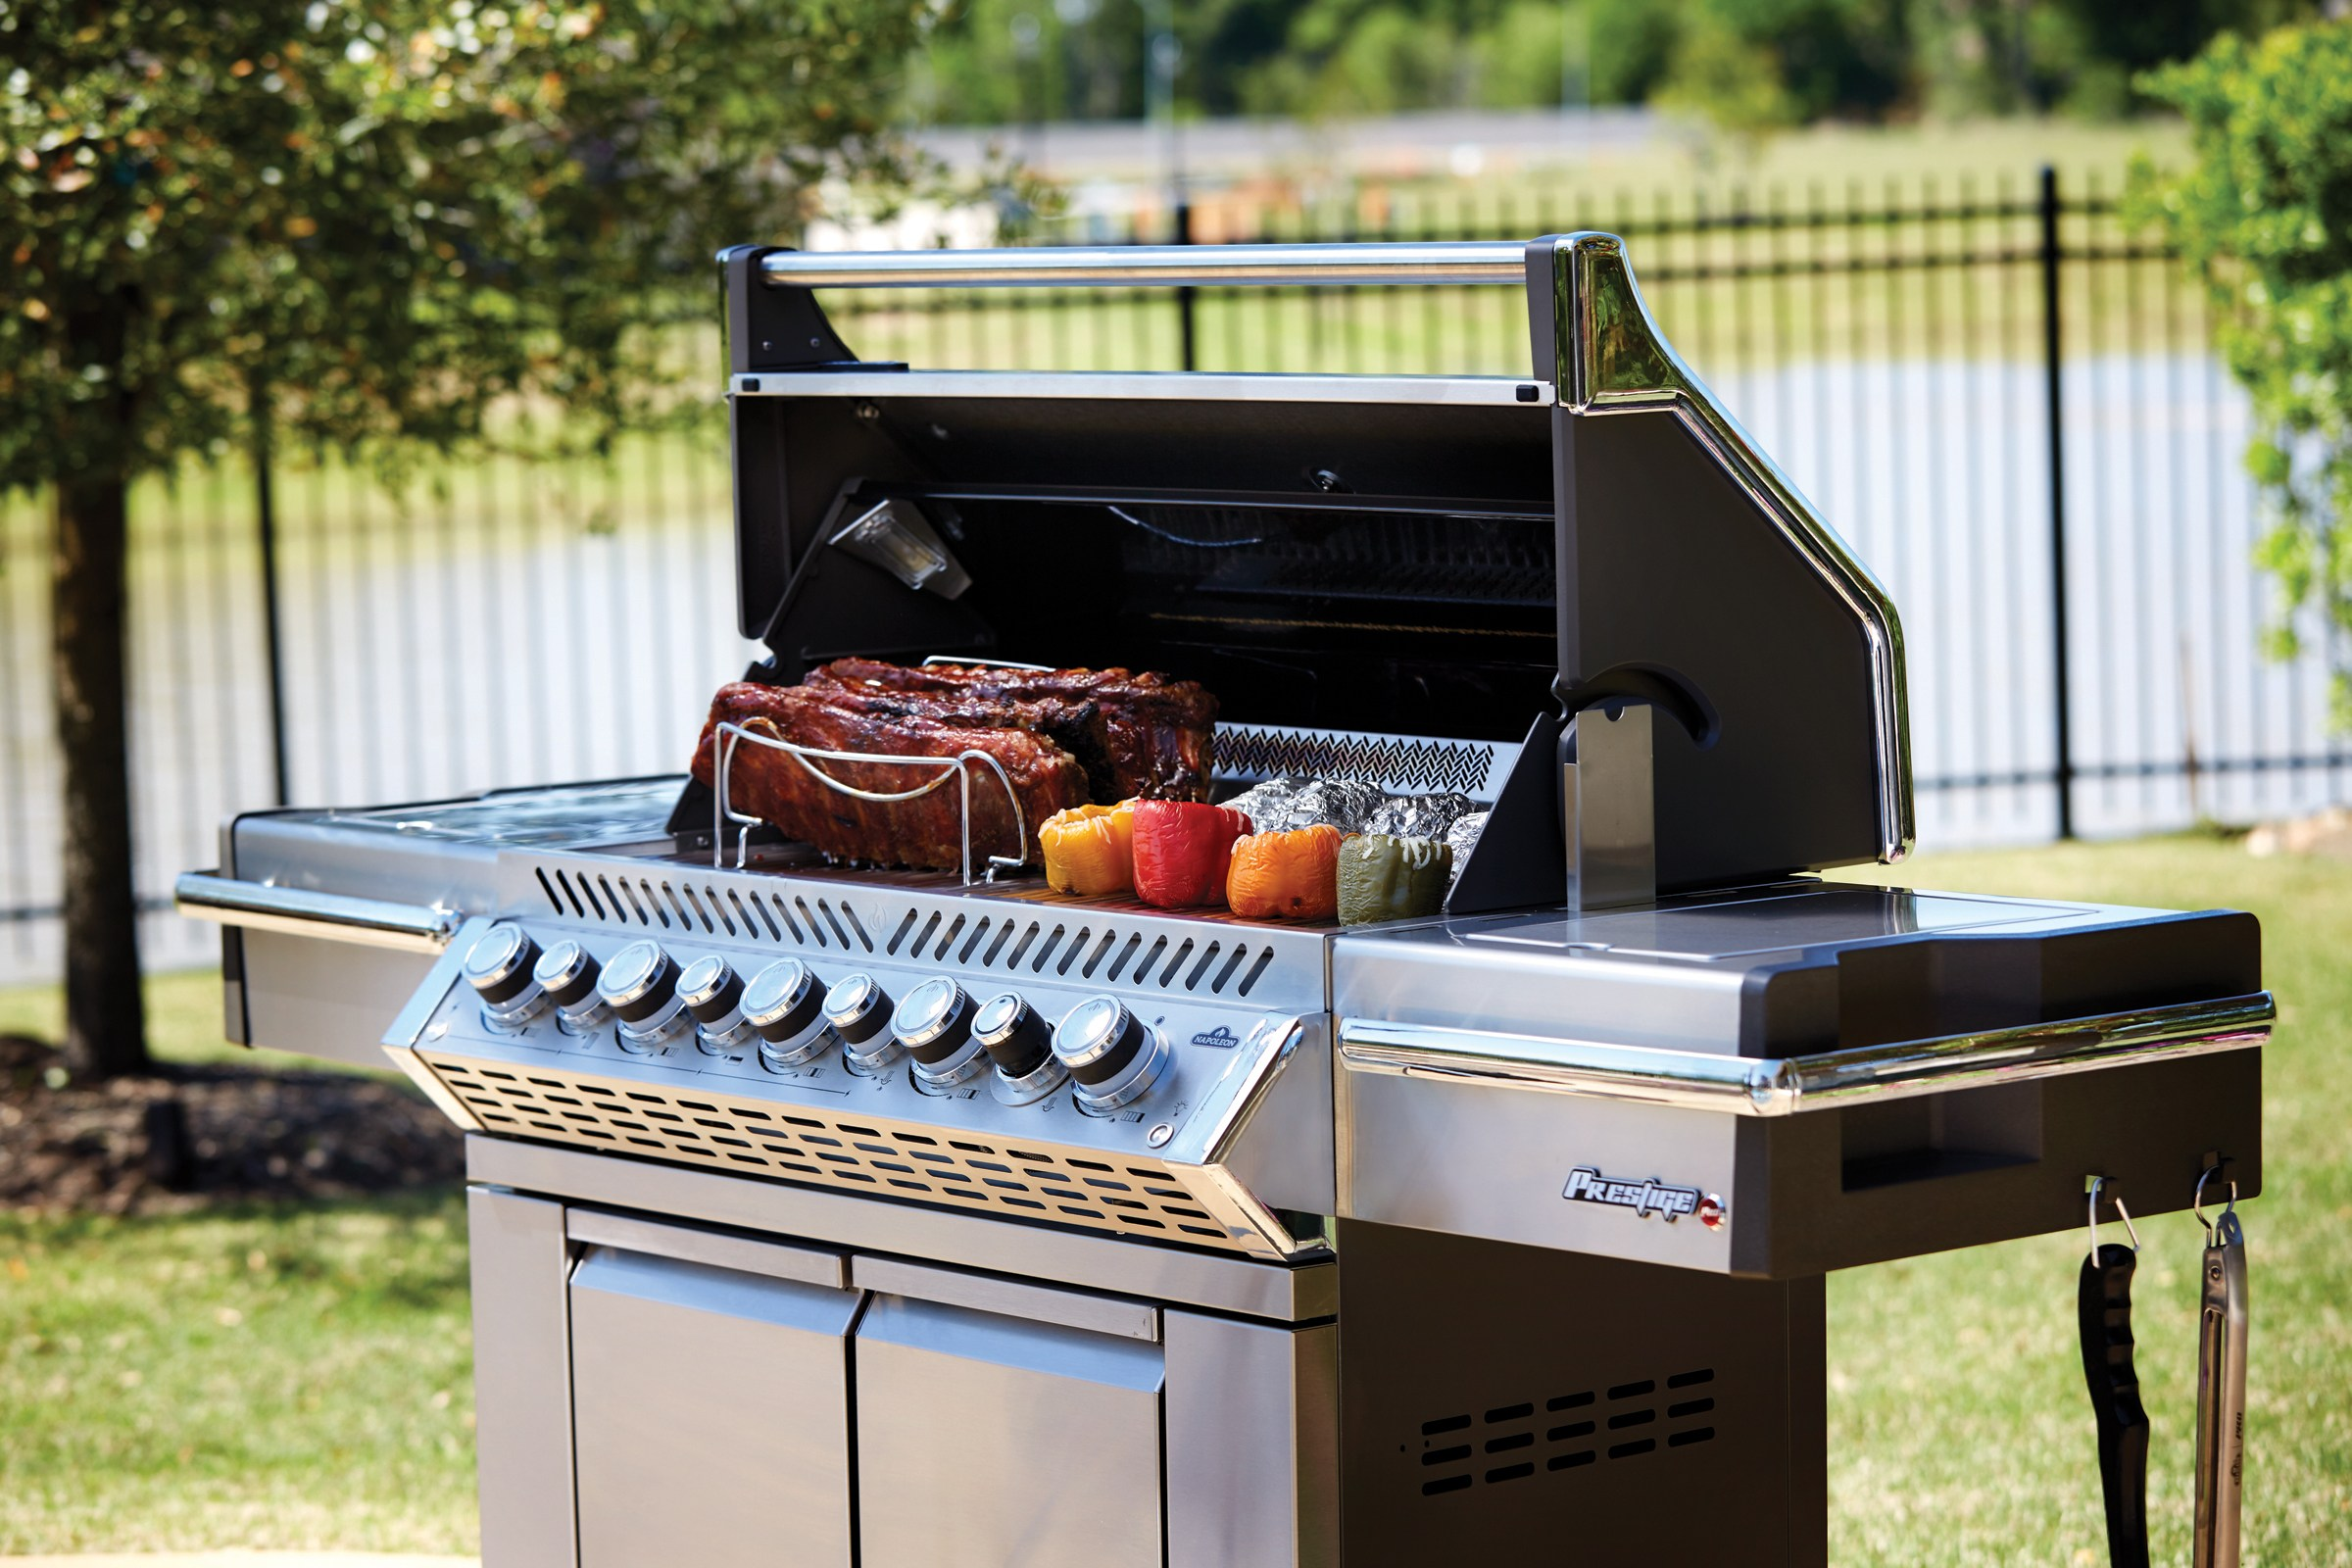 PRO665RSIB-2-lifestyle-angle-food-on-grill-napoleon-grills